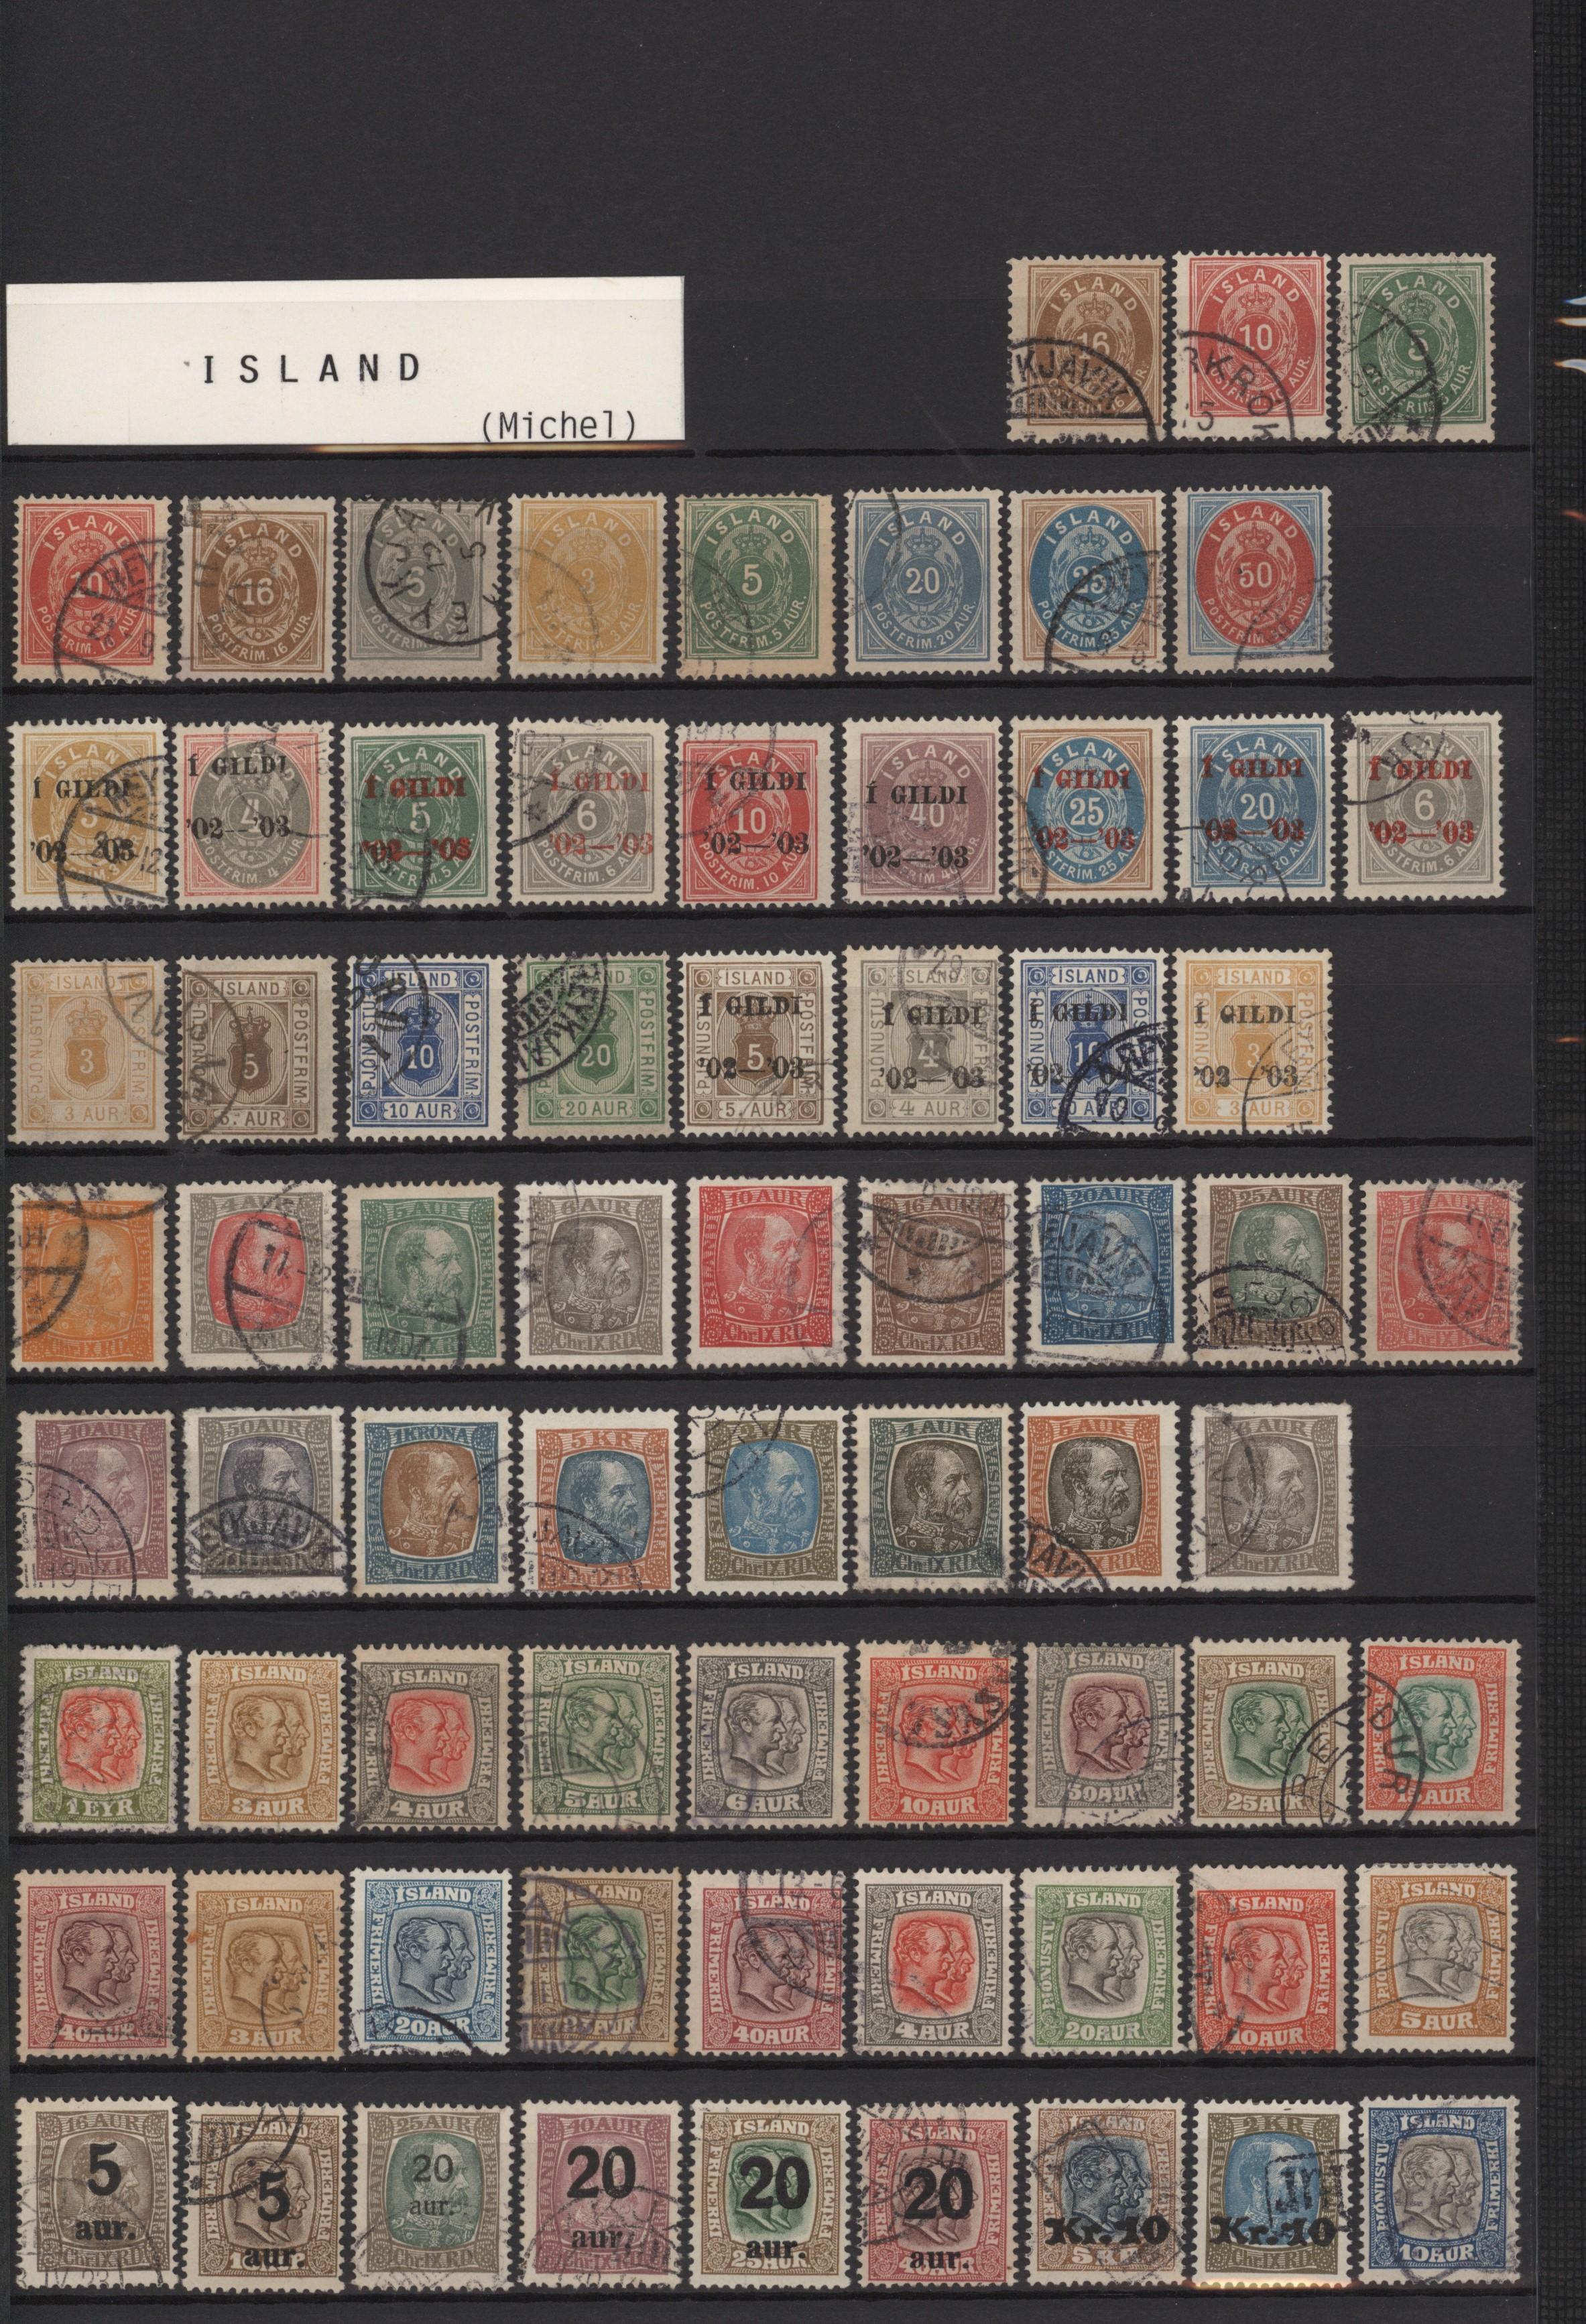 Lot 22417 - nachlässe  -  Auktionshaus Christoph Gärtner GmbH & Co. KG Sale #49 Collections Overseas, Thematics, Europe, Germany/Estates